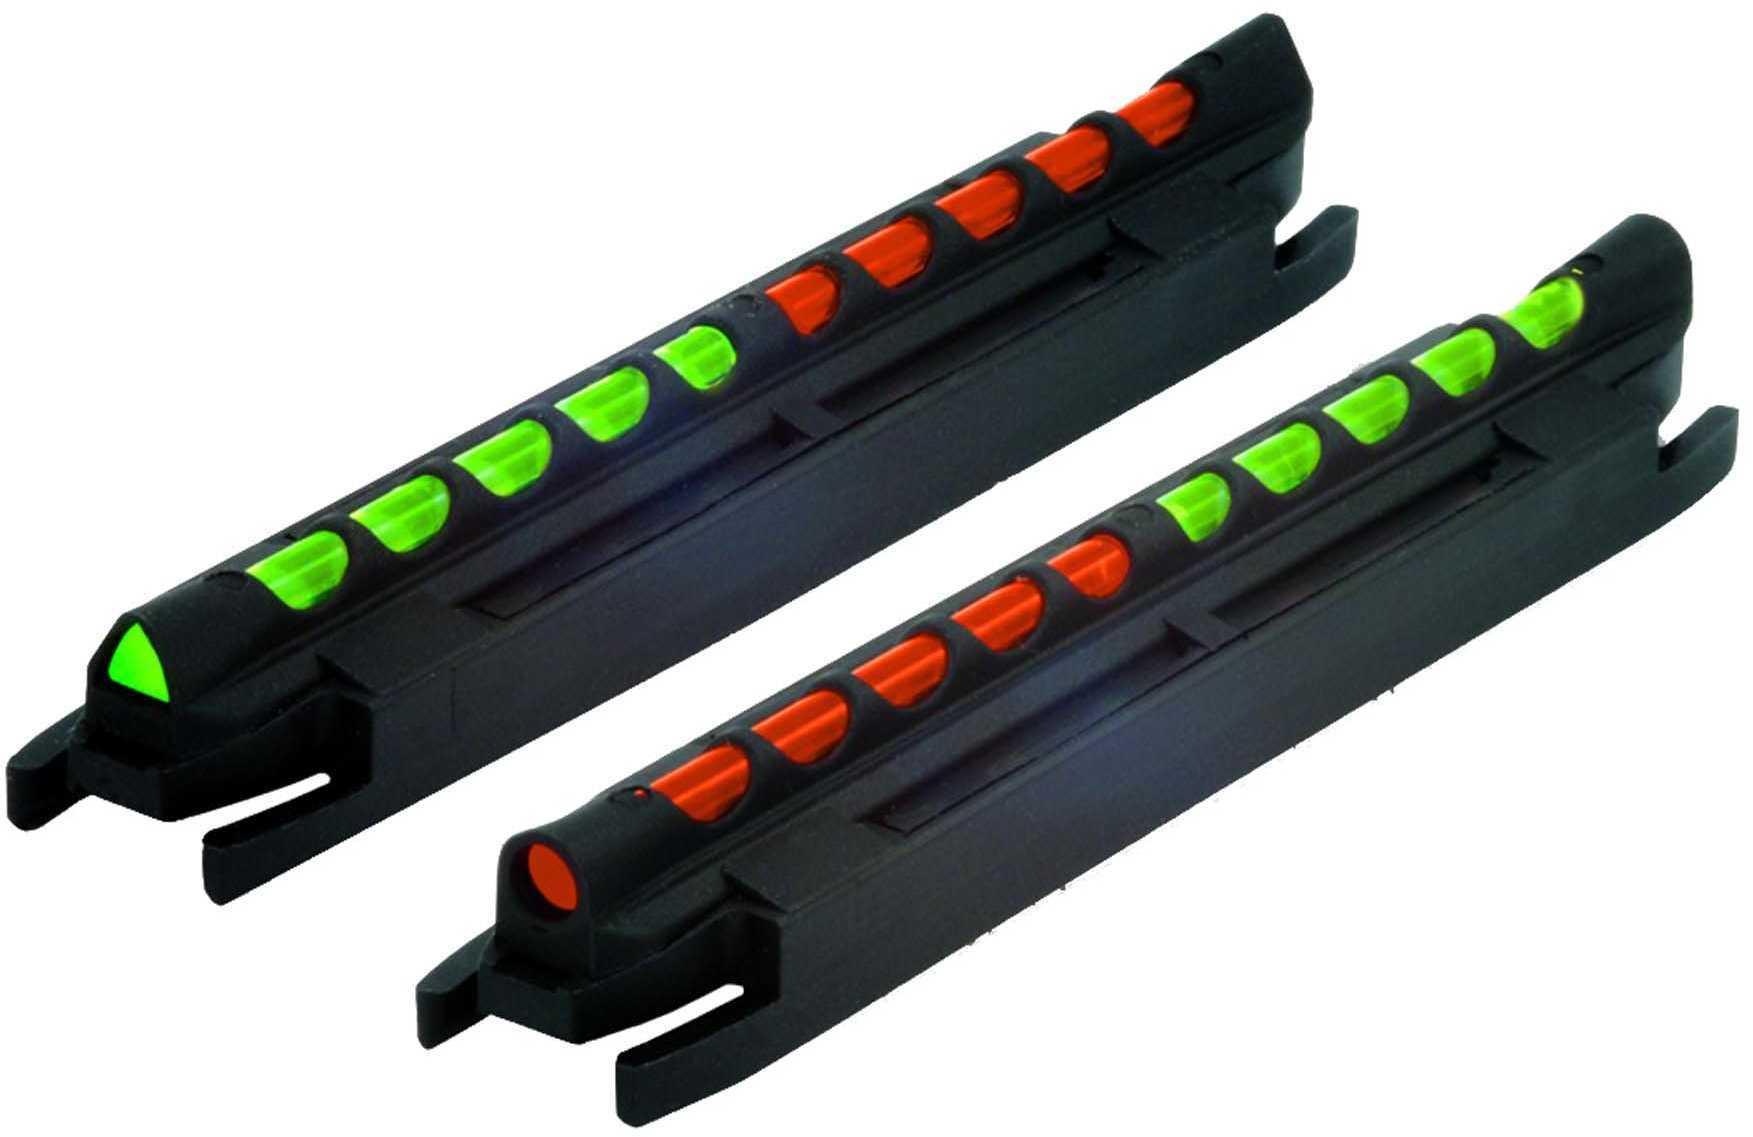 "HiViz Sight Systems HiViz Magnetic Combo Sight .330"" To .355"" Md: To350"